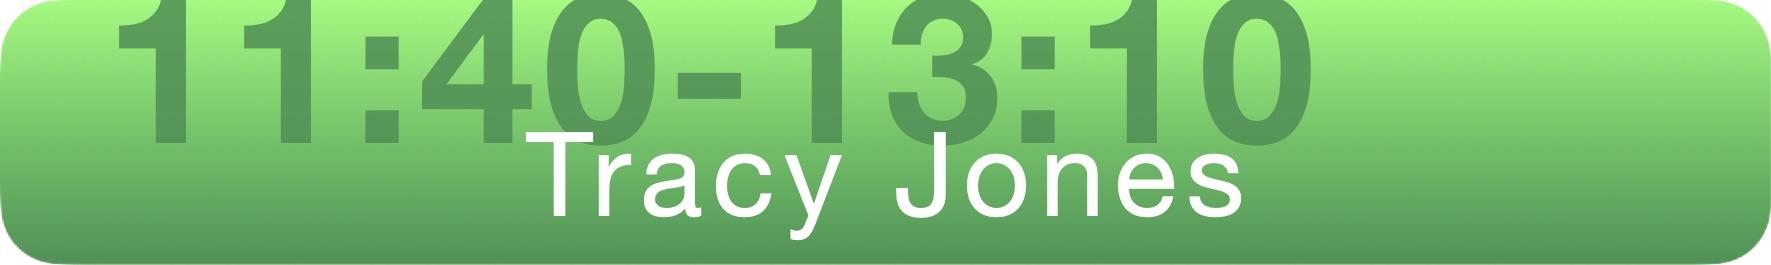 aa-tracy-jones-1140